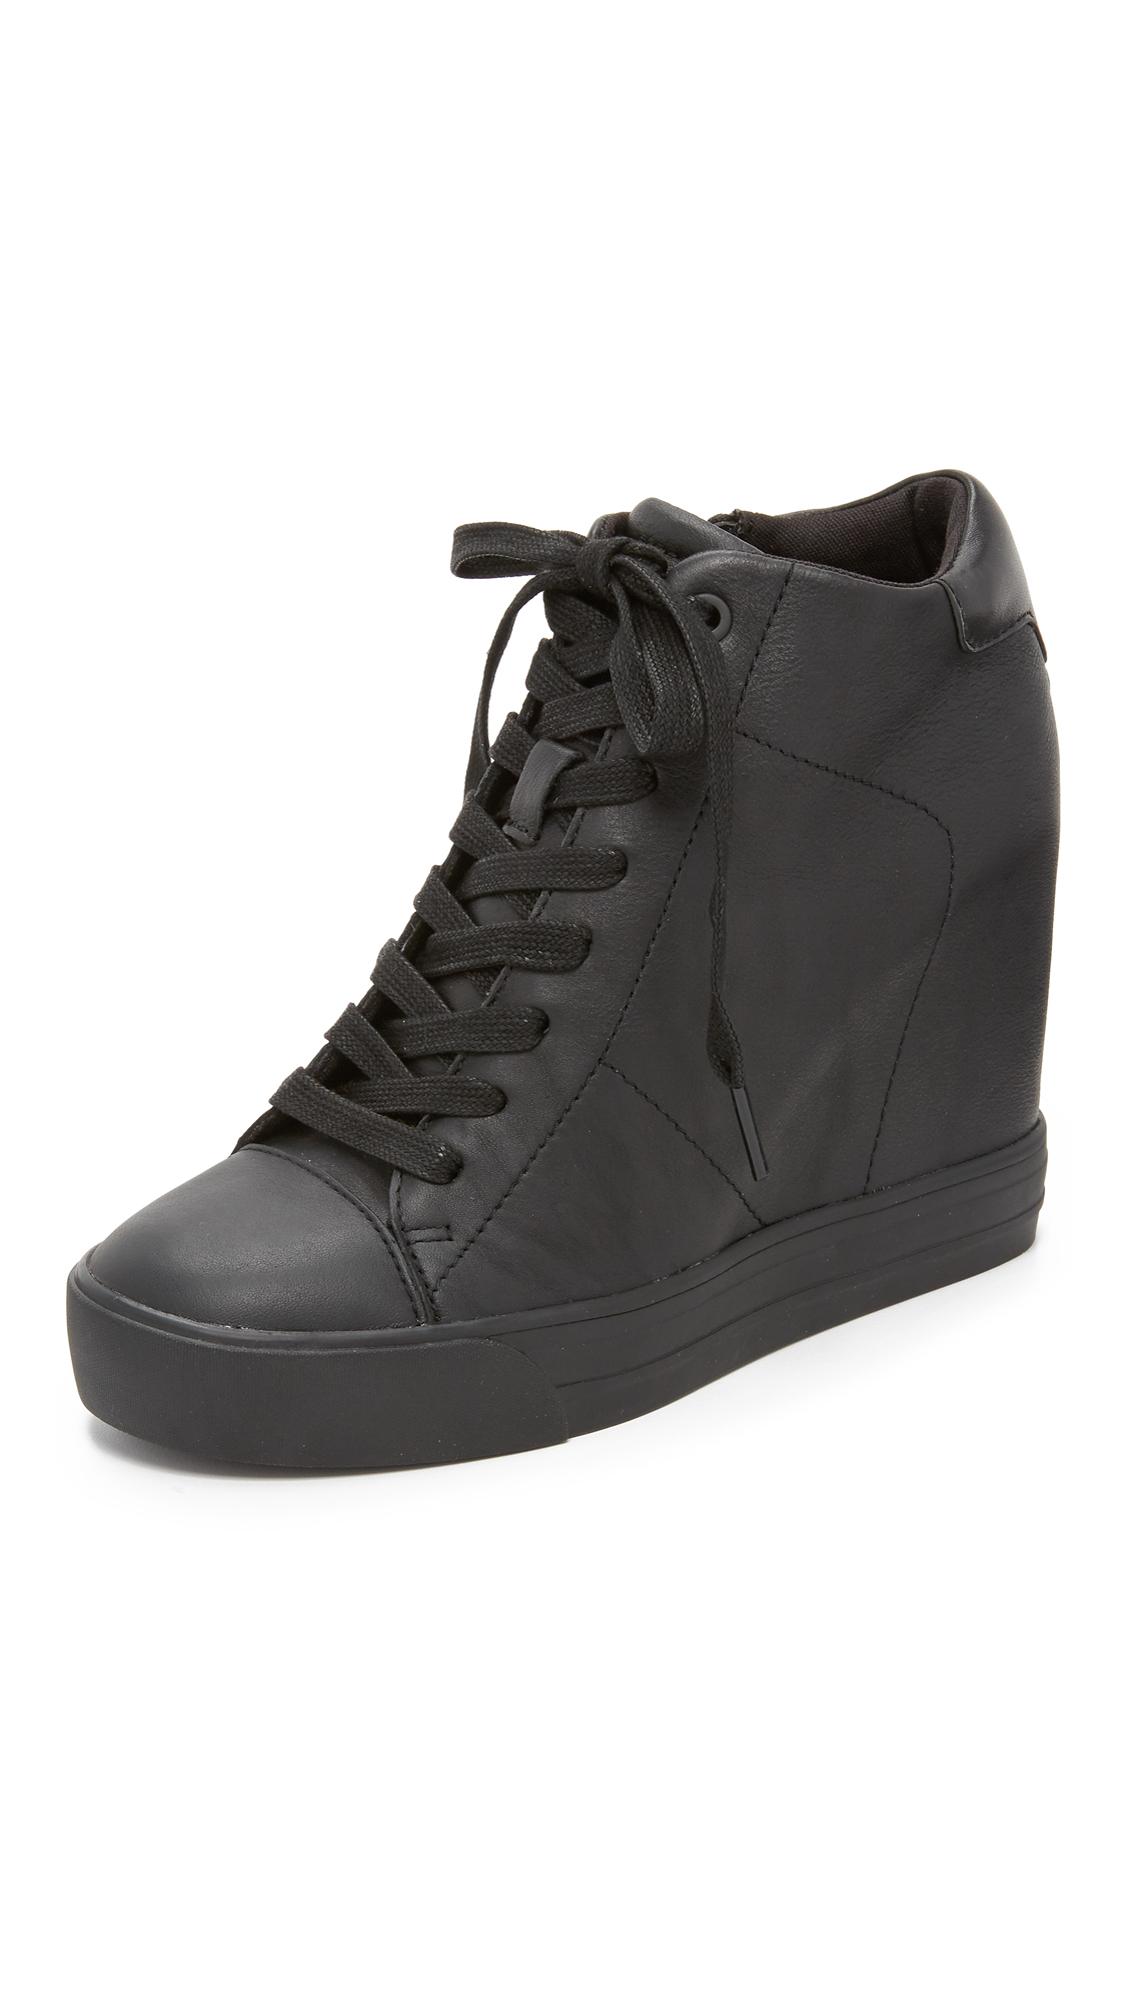 455e9bc0992 DKNY Ginnie Wedge Sneakers